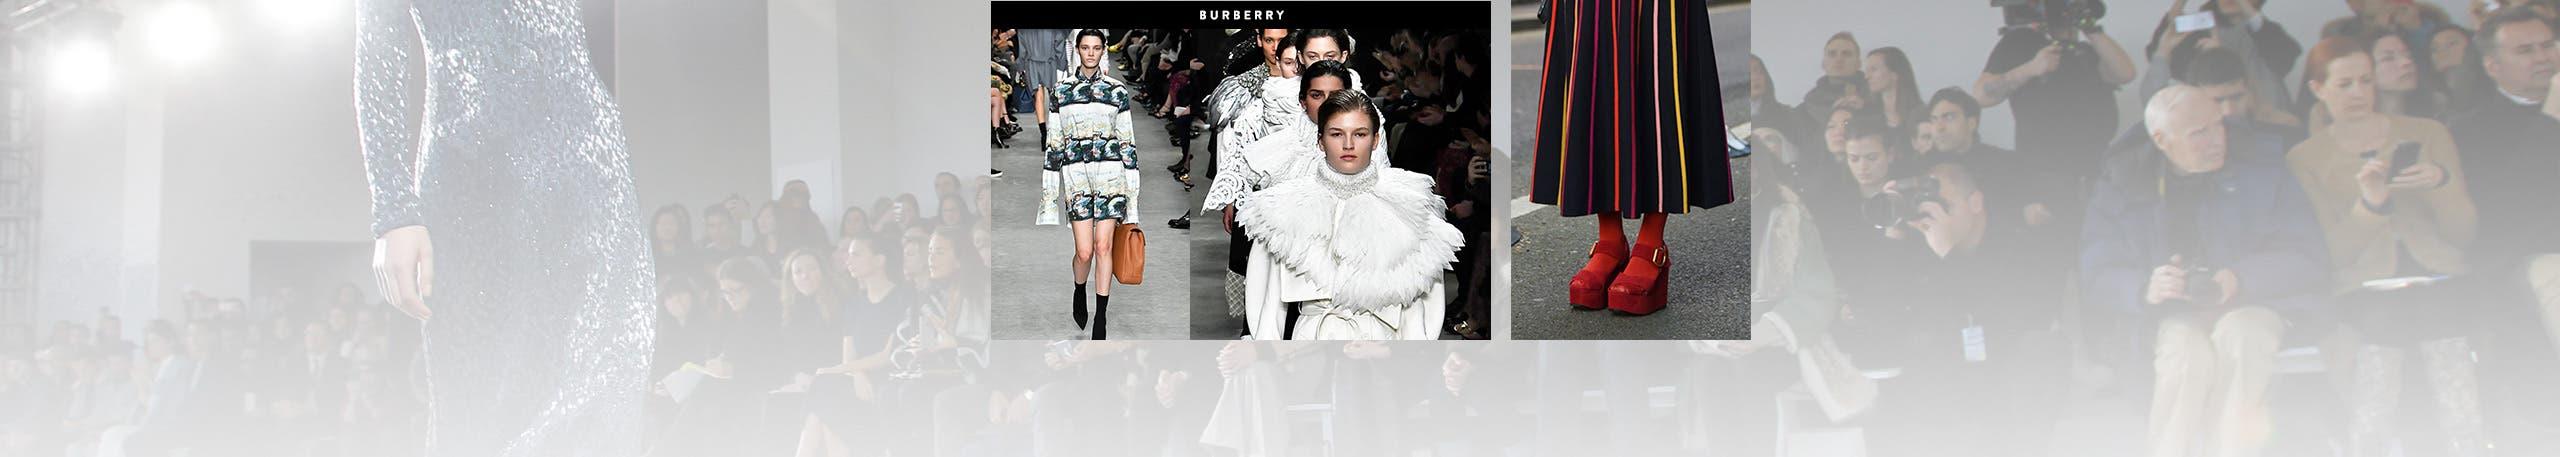 Burberry at London Fashion Week fall 2017. London Fashion Week street style.